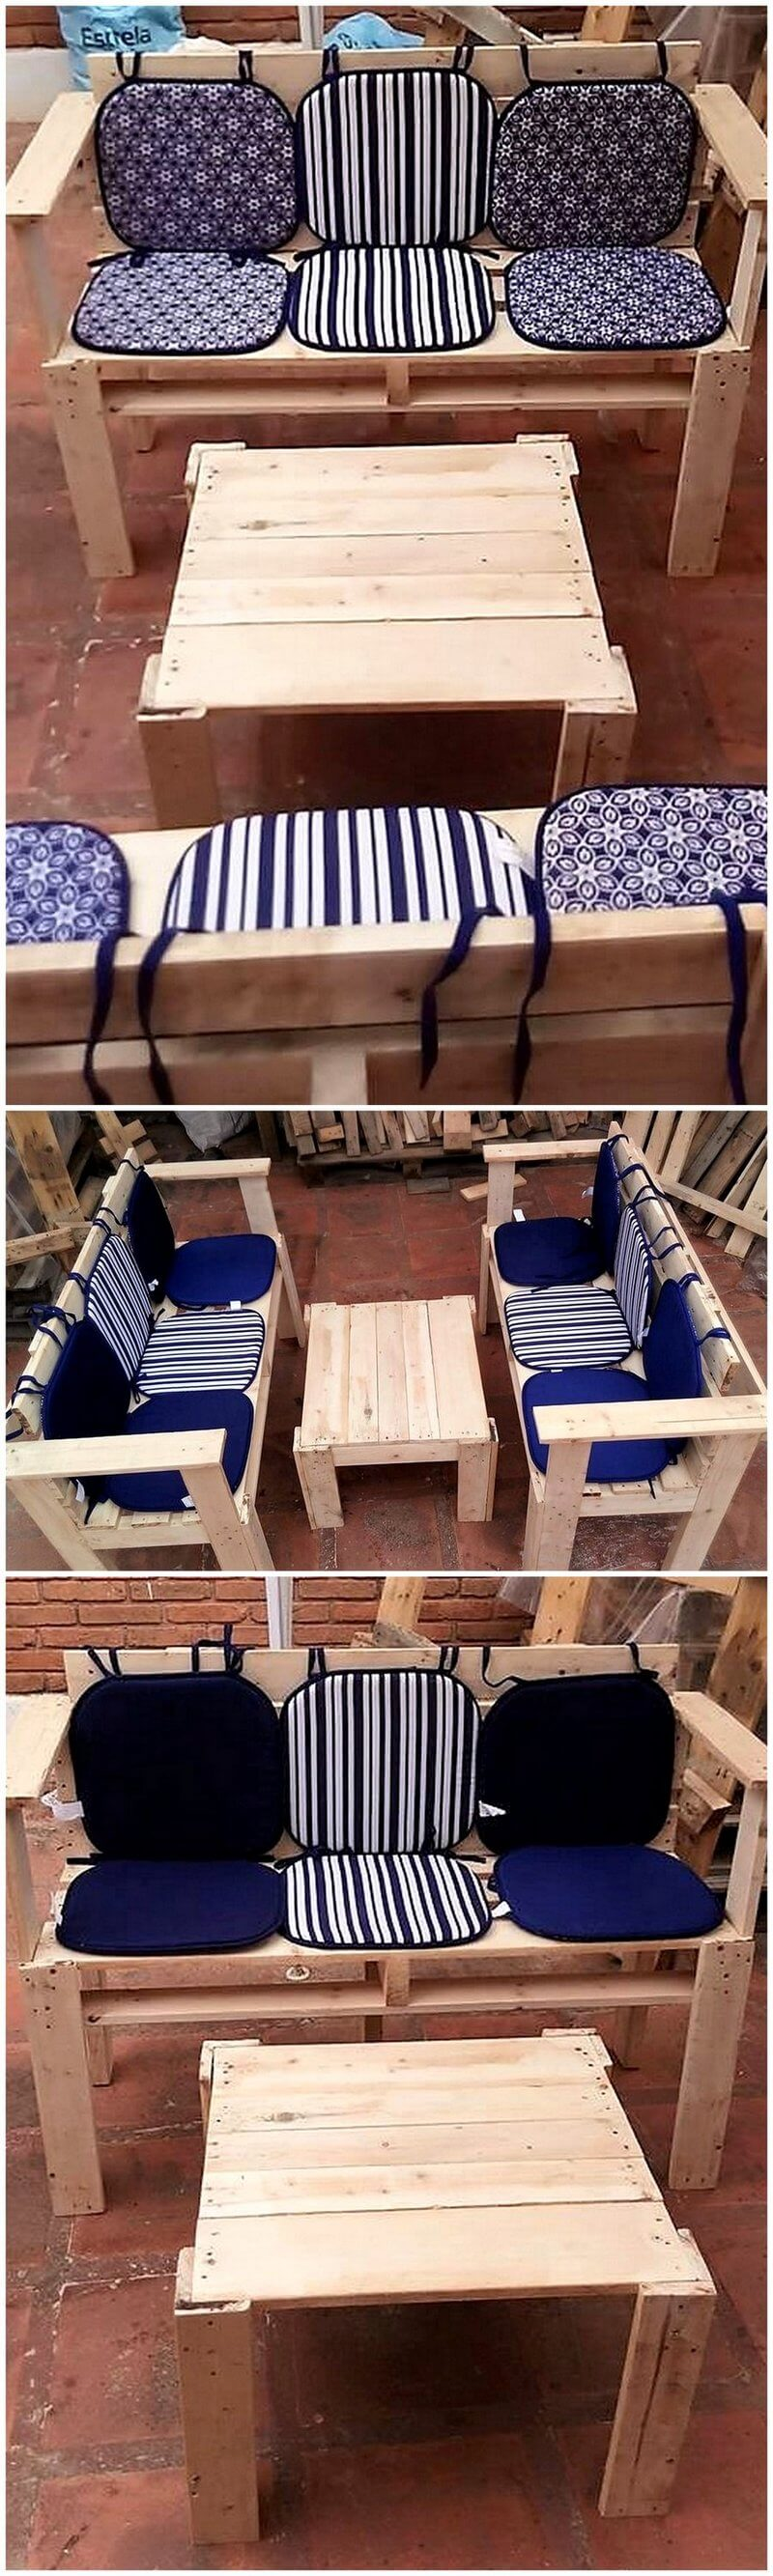 repurposed pallet furniture set